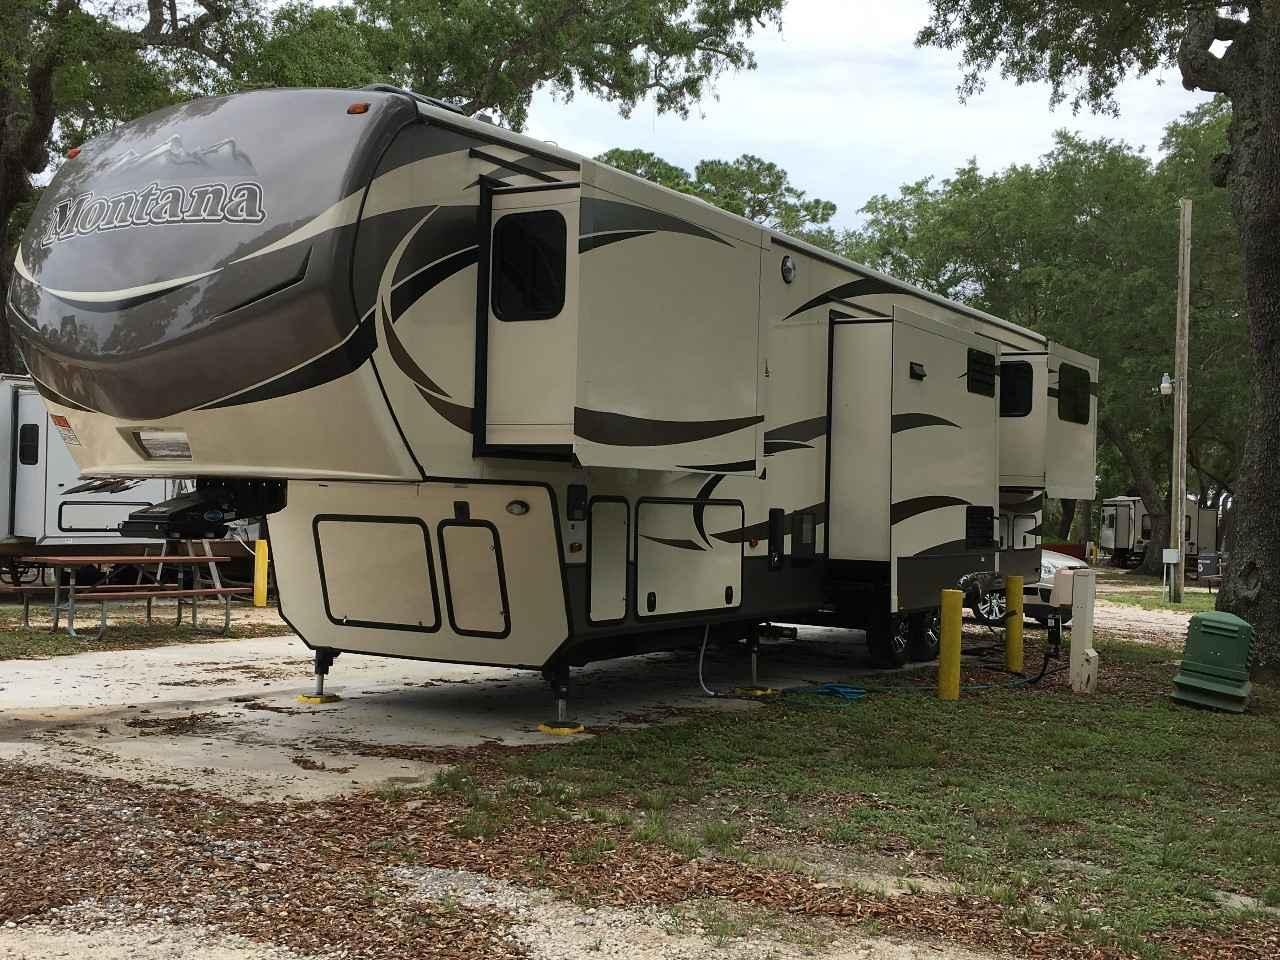 2016 Used Keystone Montana 3790rd Fifth Wheel In Florida Fl